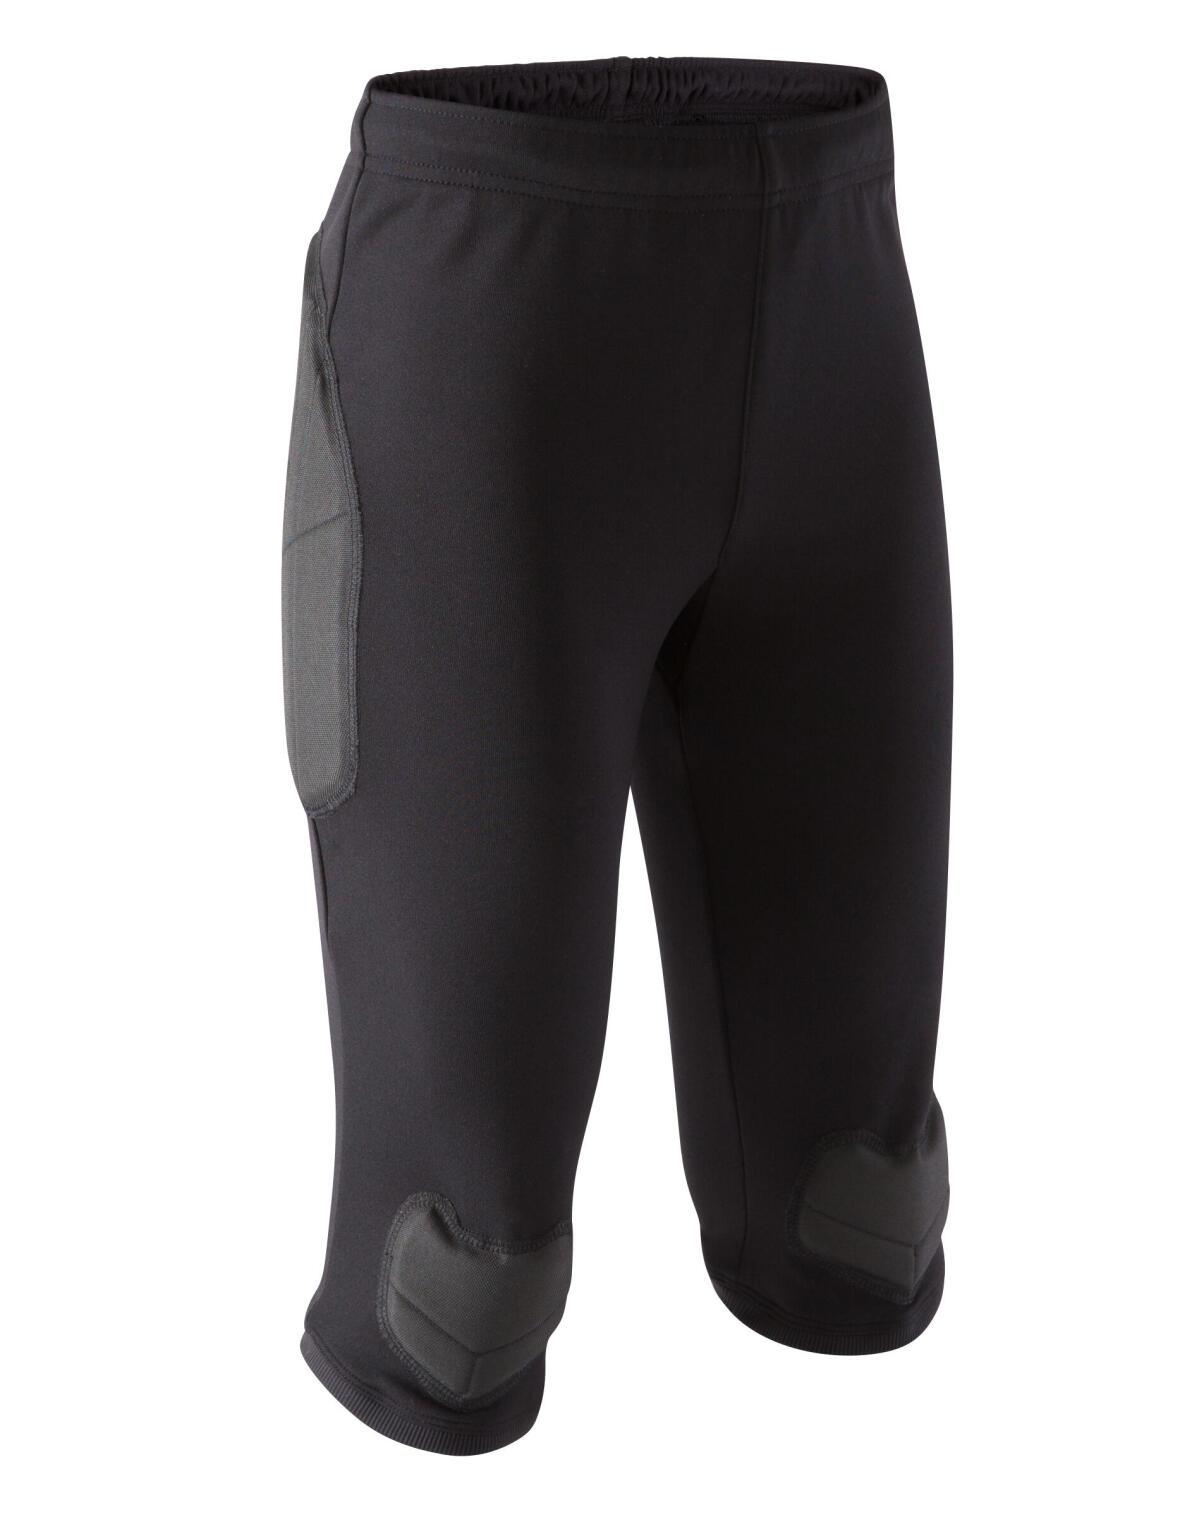 fgkp 100 jr cropped trousers blk